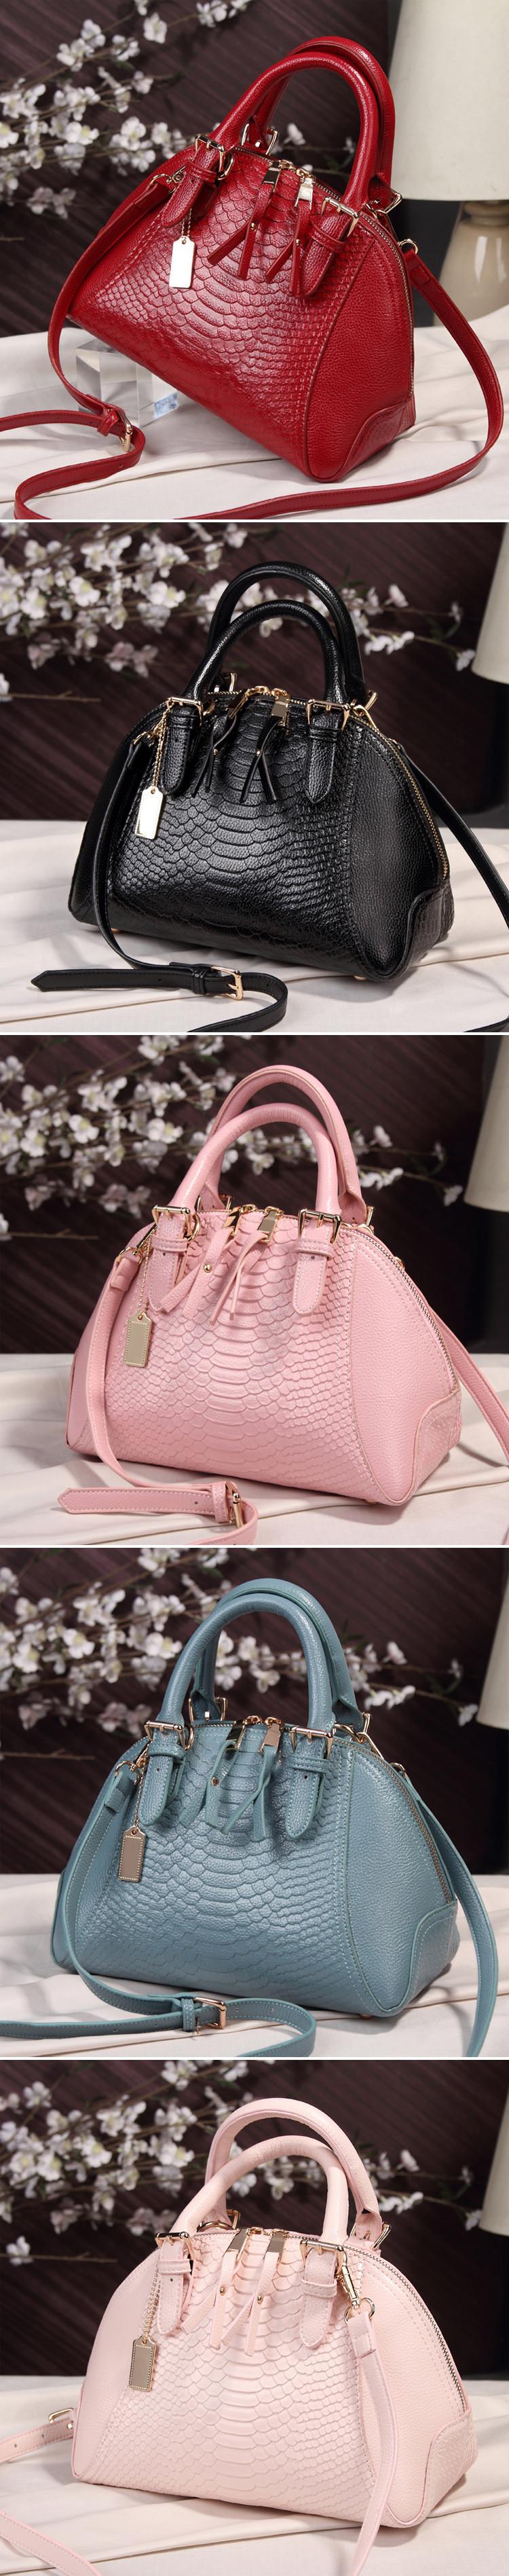 women-handbag15